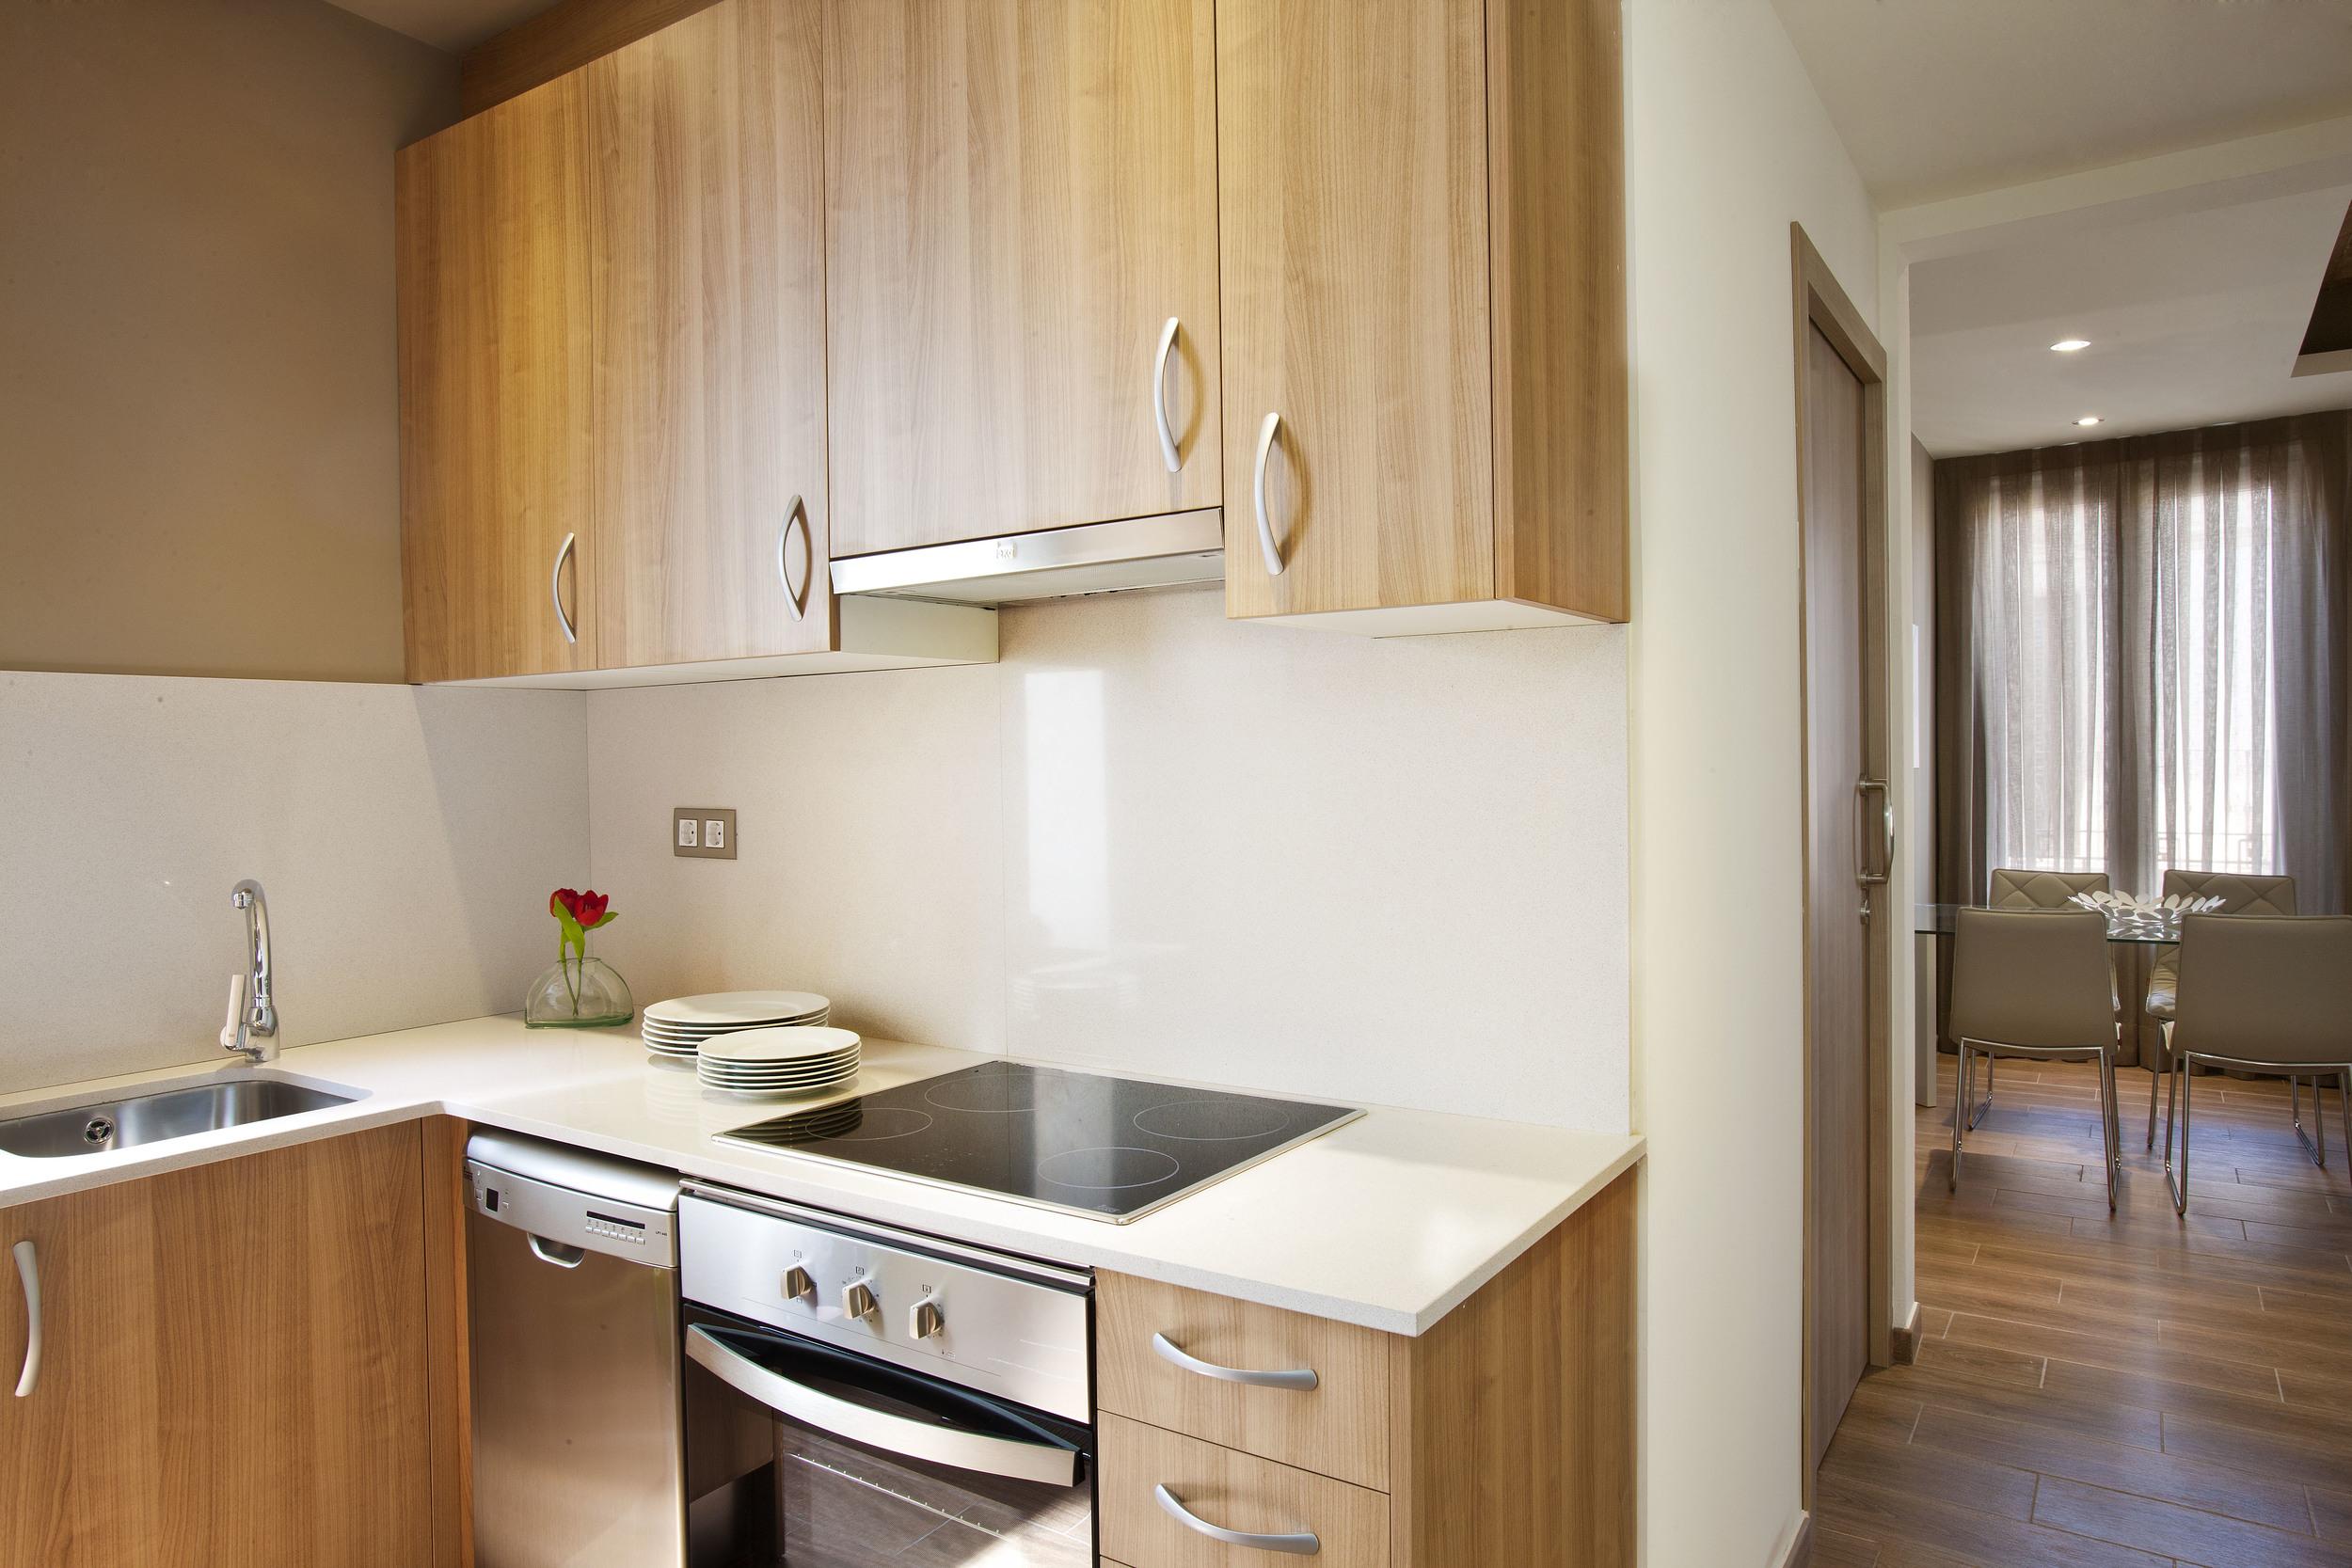 BCN APT MILA Deluxe Kitchen.JPG